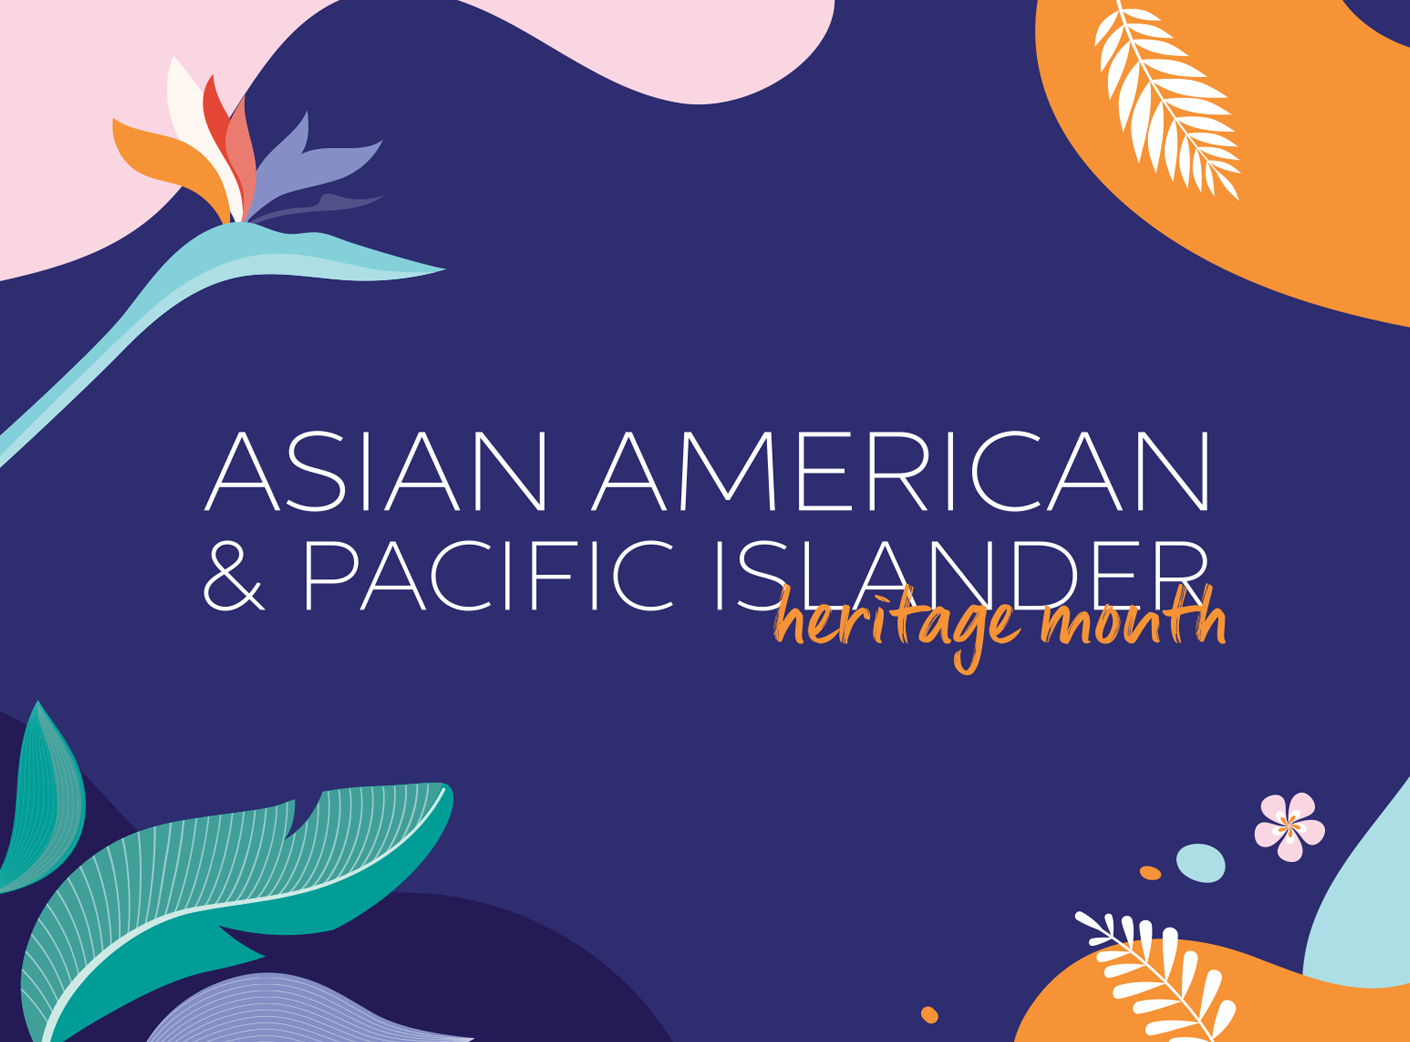 Asian American & Pacific Islander Resources